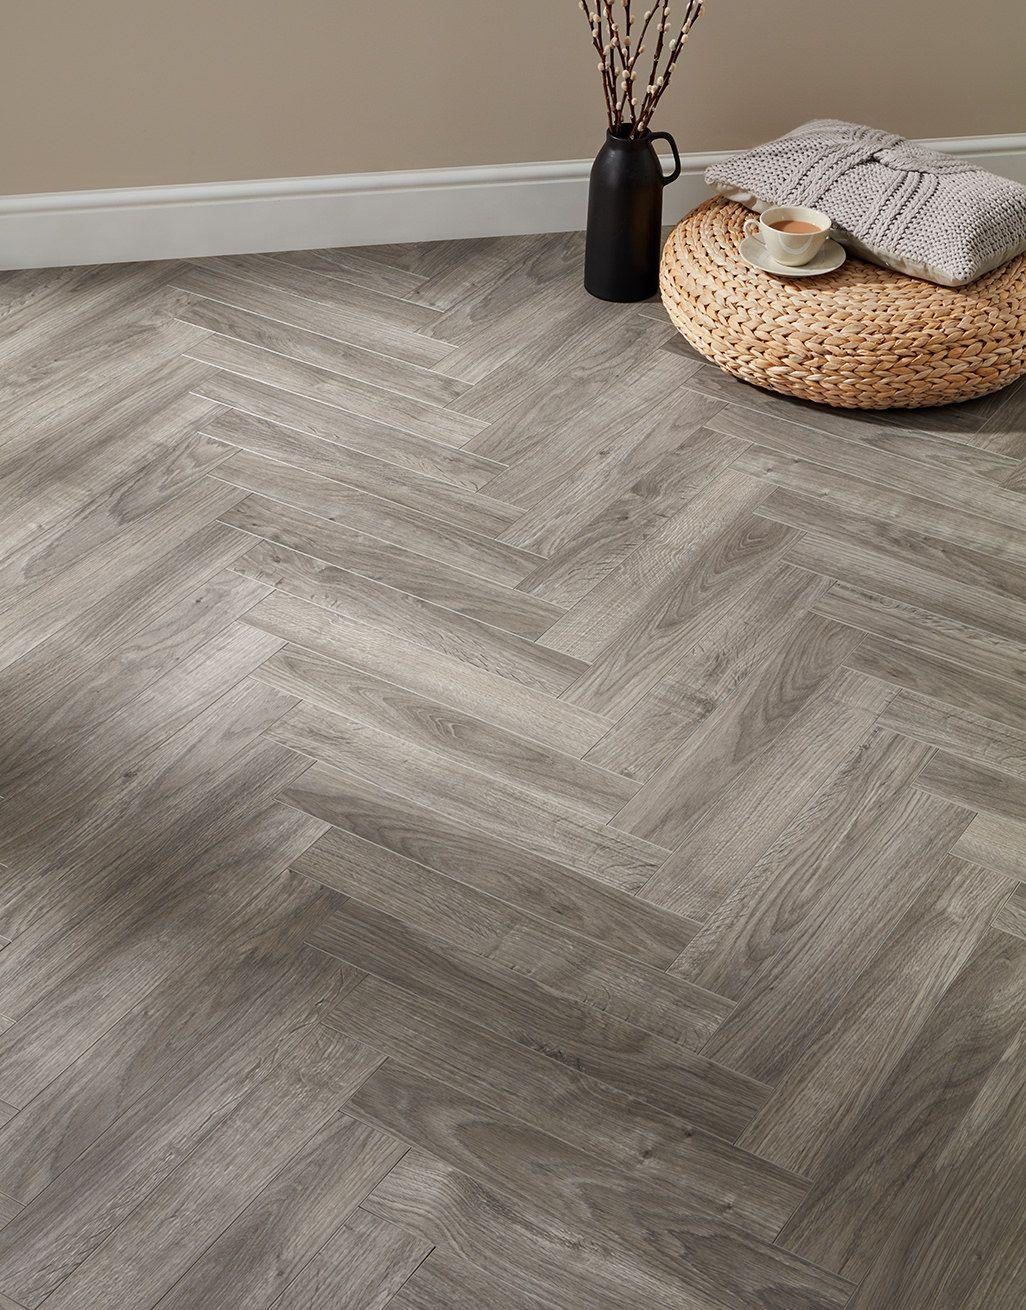 Light Grey Laminate Flooring, Laminate Wood Flooring Light Grey